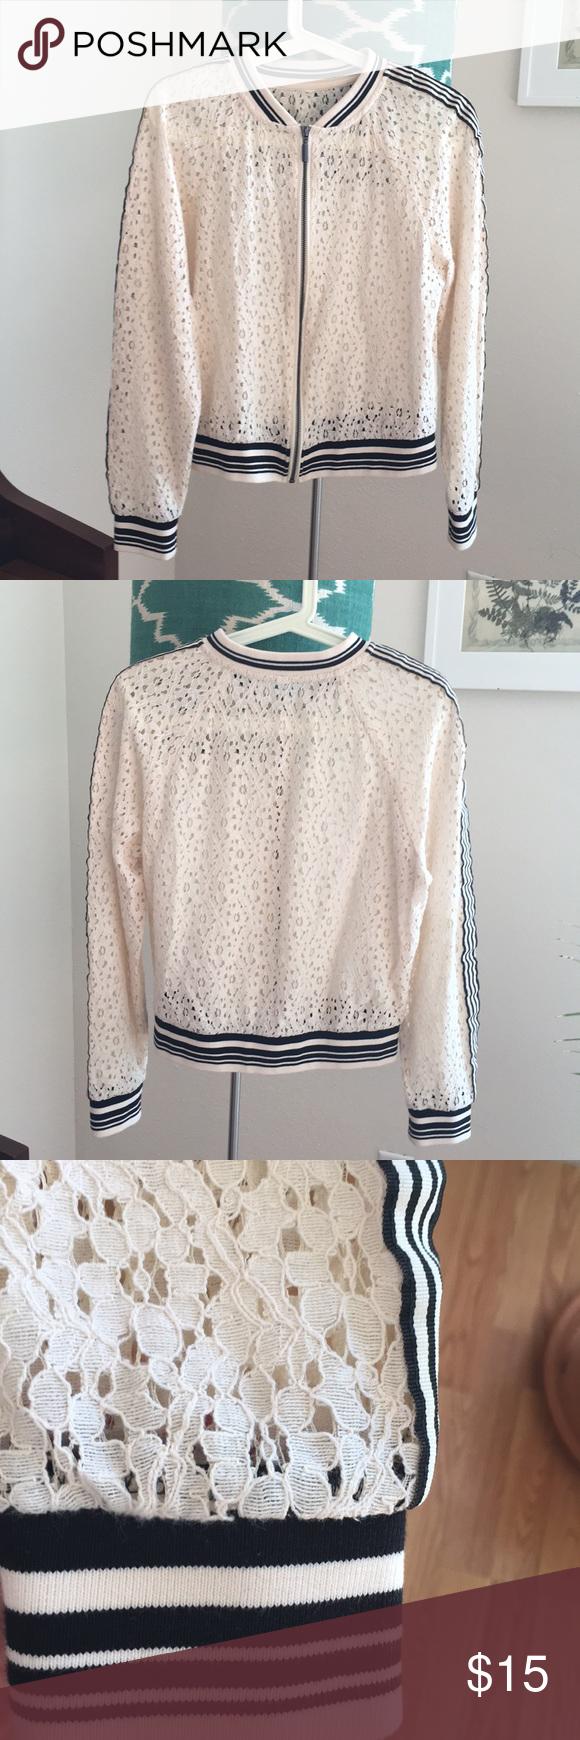 Athletic Ivory Lace Bomber Jacket And Customer Support Hanger Marksspencer Slim